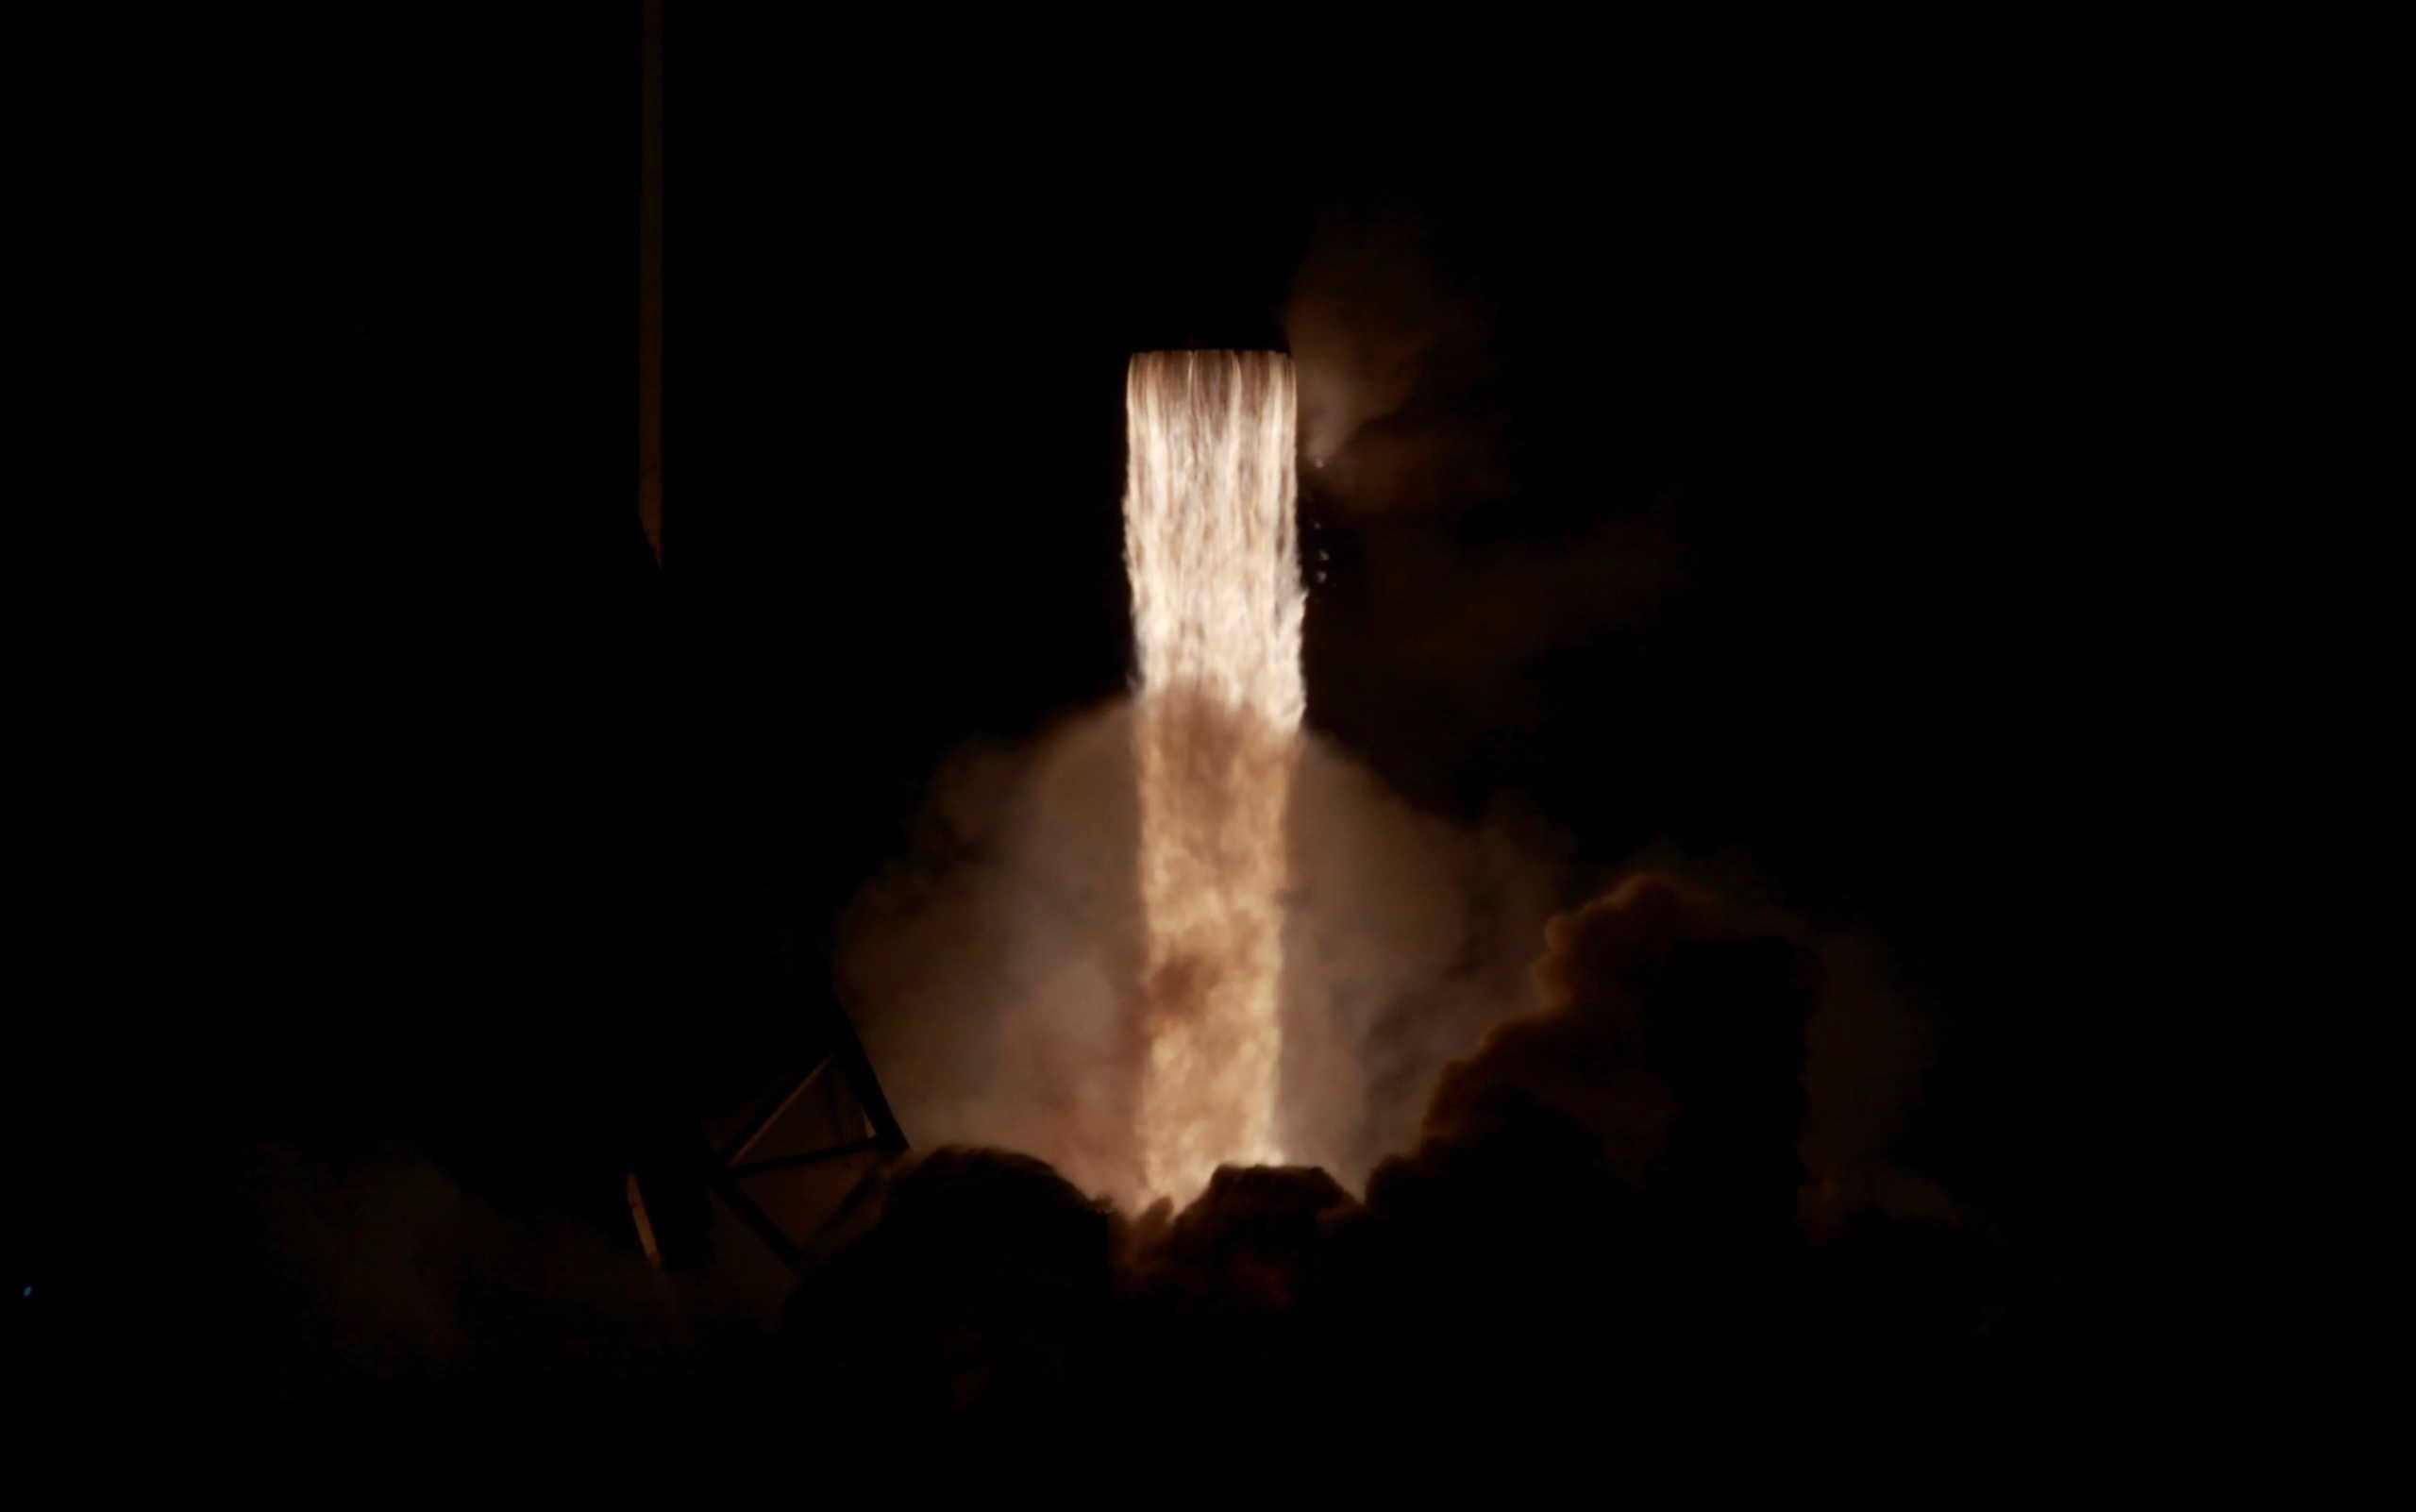 SpaceX και NASA έγραψαν ιστορία: Στο Διάστημα με 4 αστροναύτες το Crew-1 Dragon «Resilience»